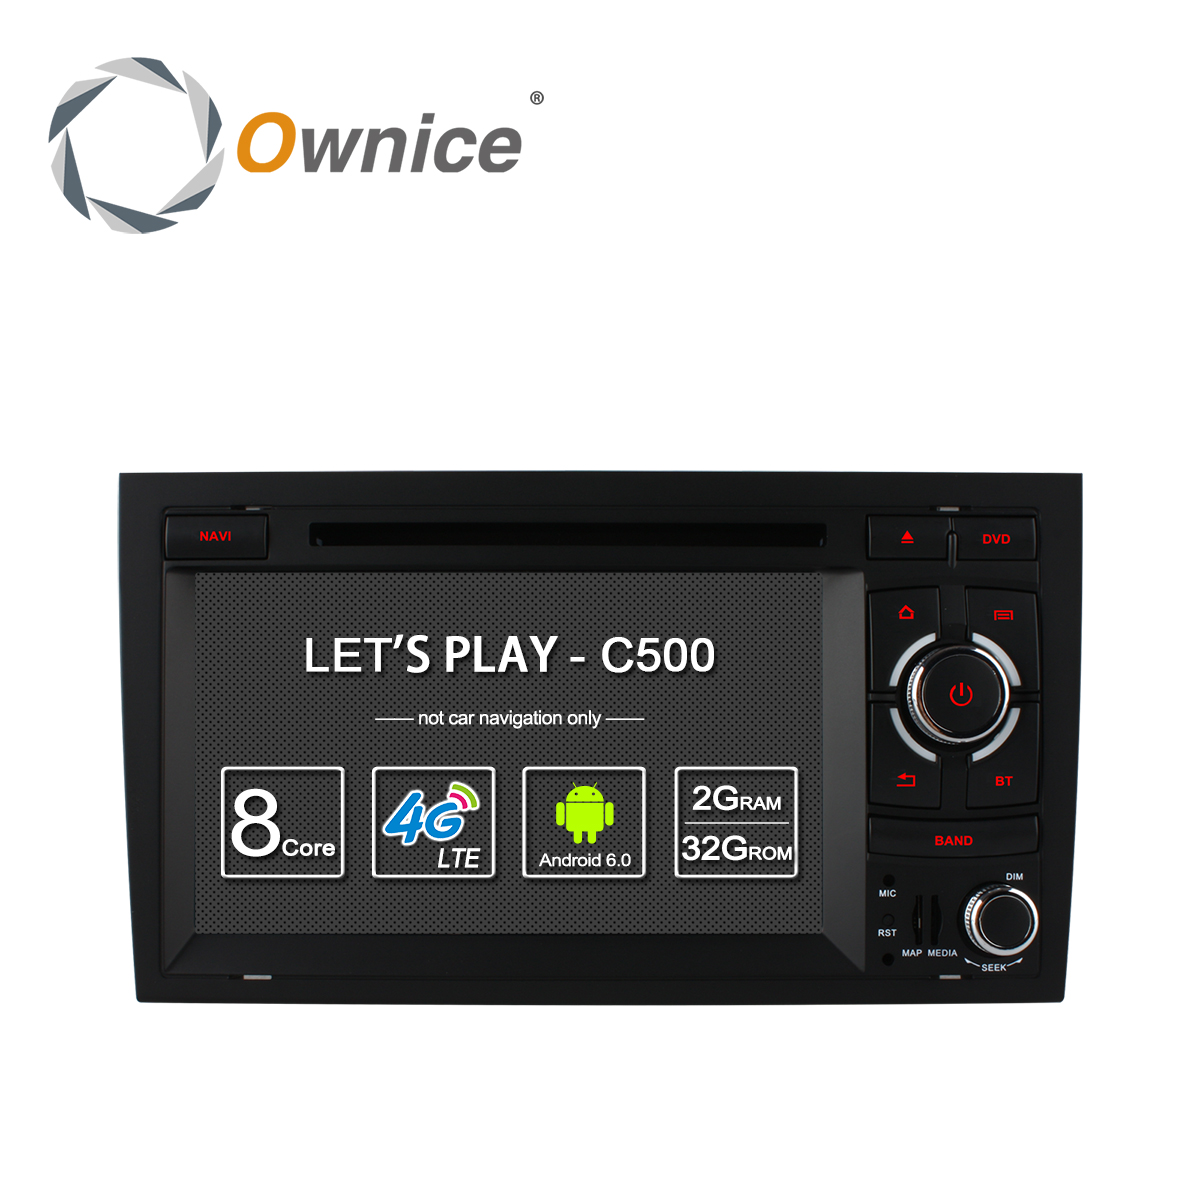 imágenes para Ownice C500 LTE Octa 8 Core 4G SIM ANDROID 6.0 DVD DEL COCHE para Audi A4 2002-2008 wifi GPS BT Radio 2 GB RAM 32 GB ROM